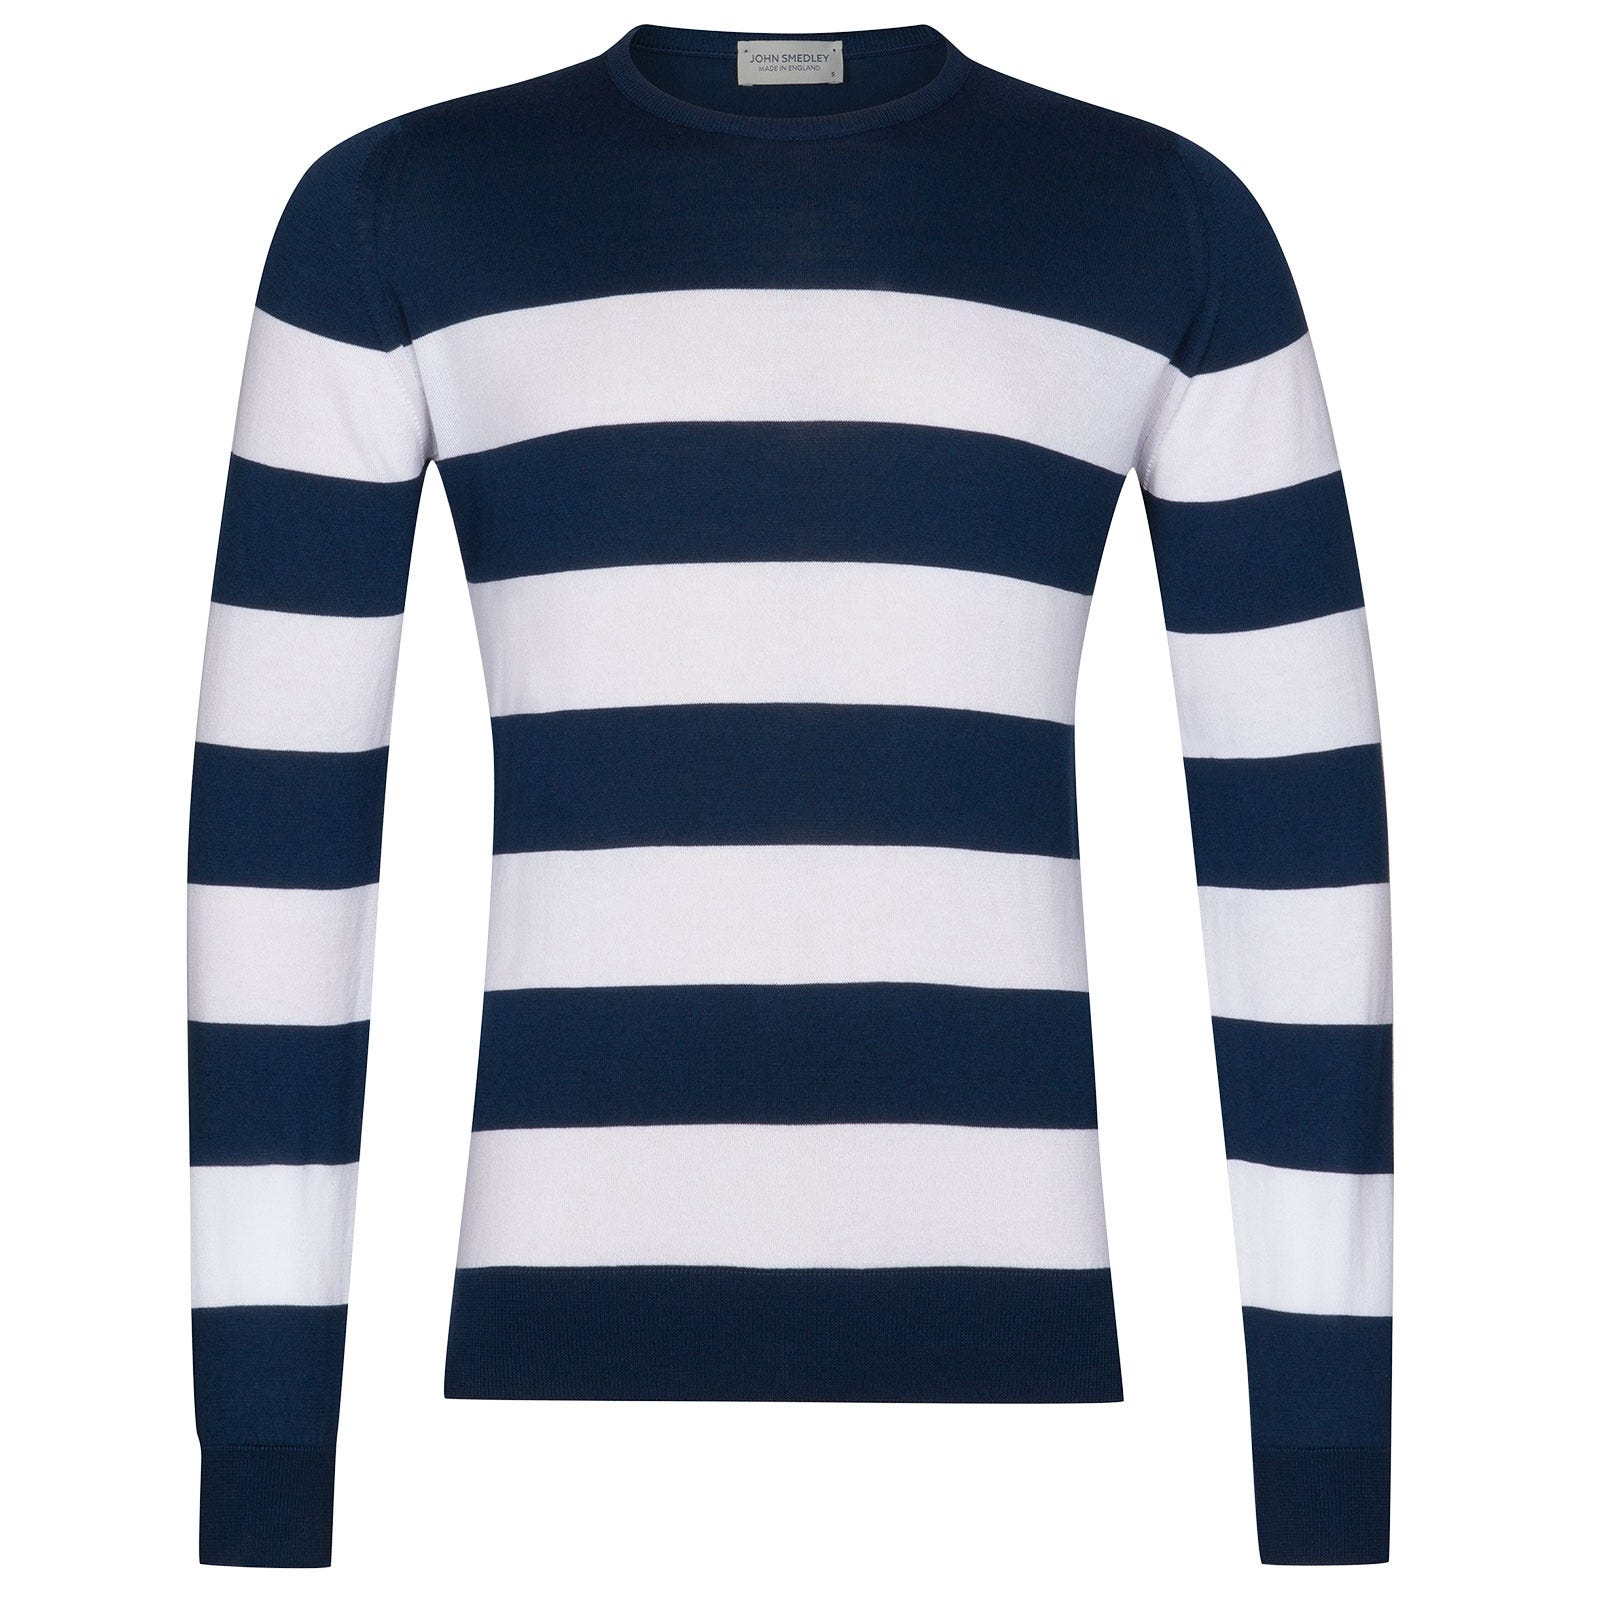 John Smedley Raydon Sea Island Cotton Pullover in Indigo-S